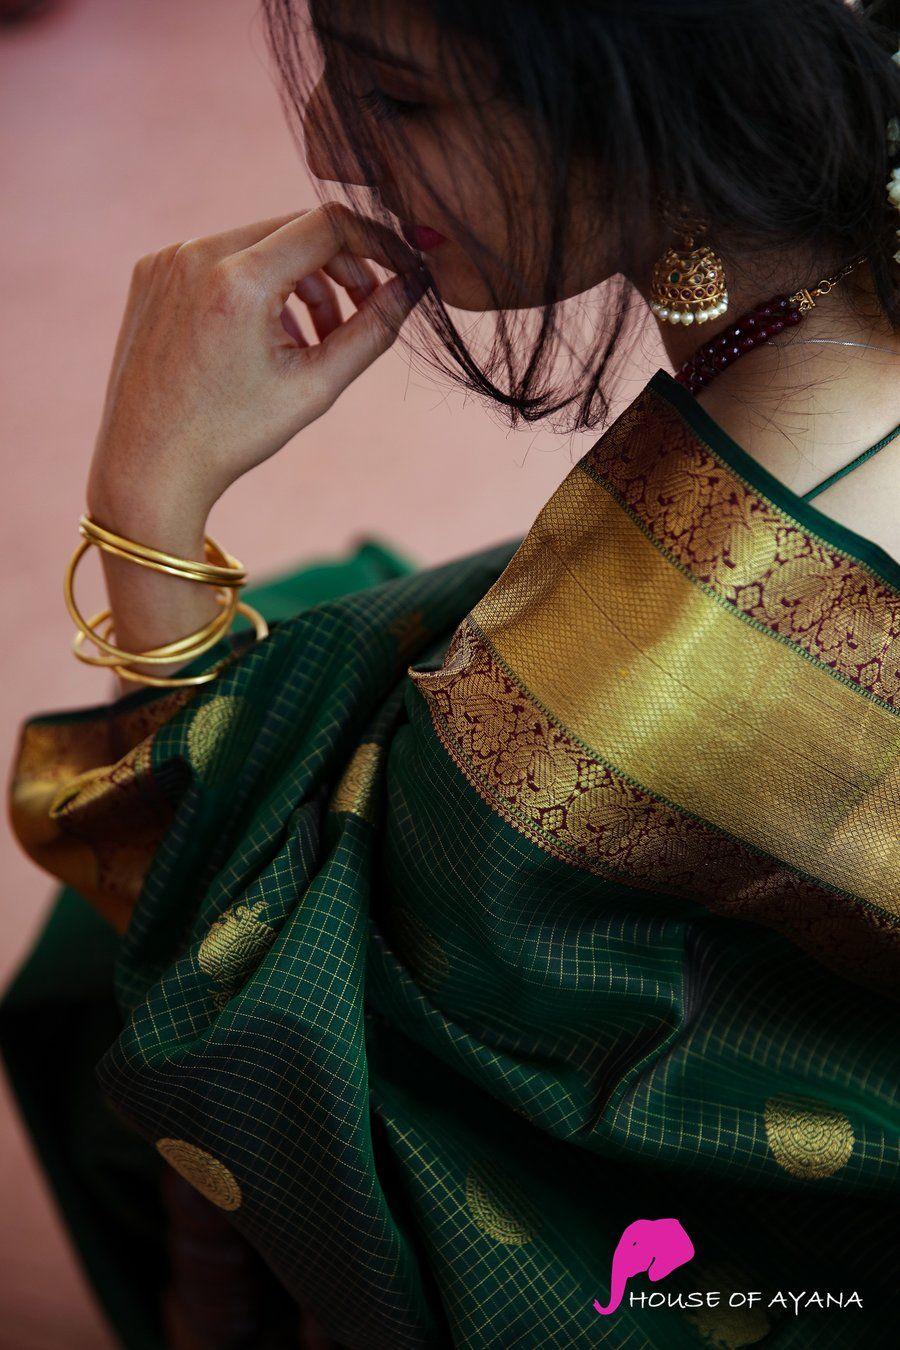 Kanchipuram Silk Sarees Shop In Chennai Bridal Kanchipuram Sarees House Of Ayana Photography Poses Women Fashion Photography Poses Saree Photoshoot Tell us your favorite pose and give feedbacks too. kanchipuram silk sarees shop in chennai